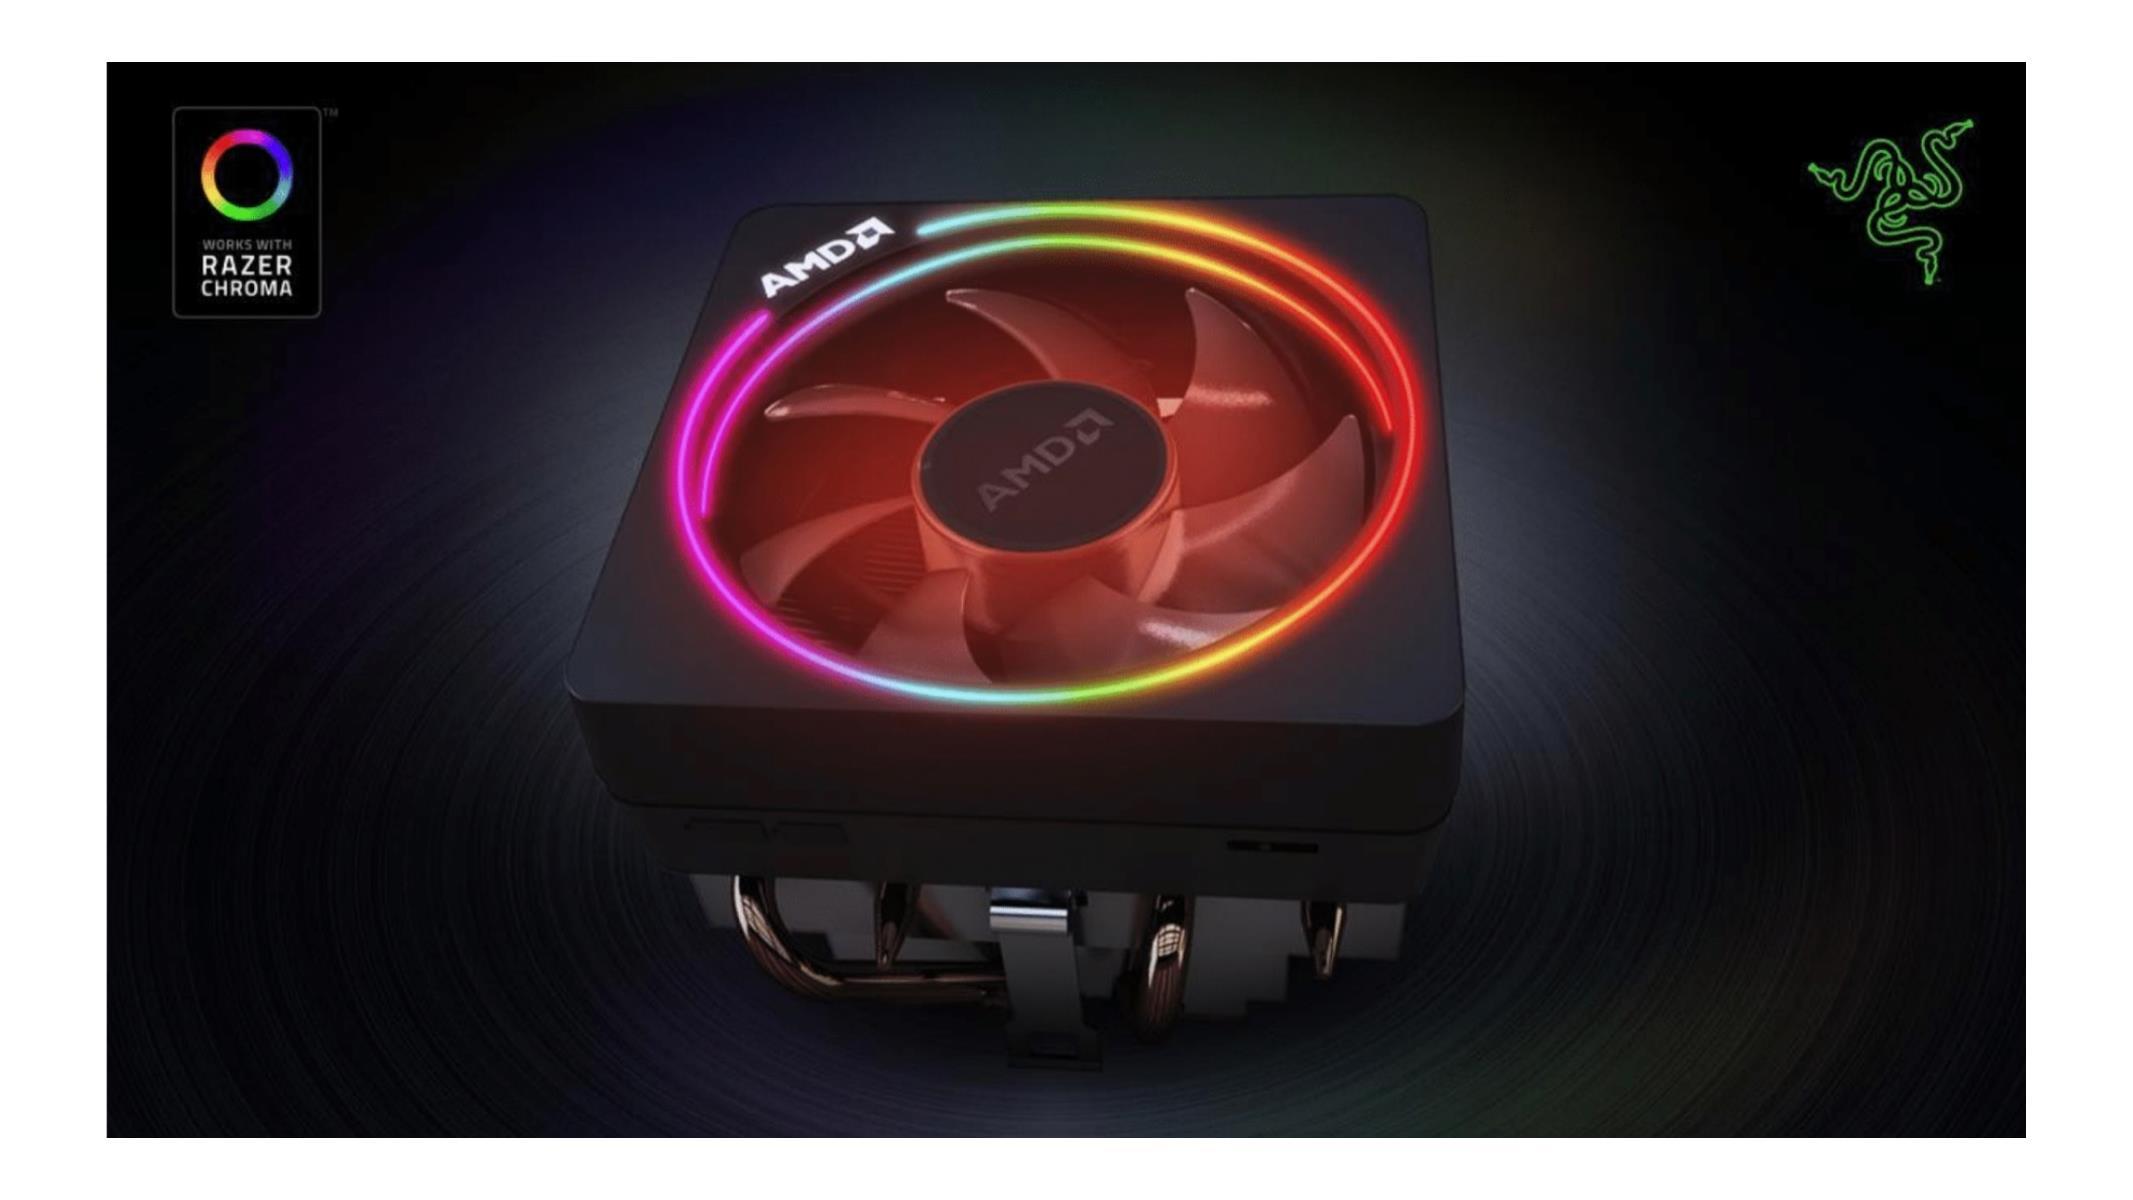 Razer Adds Chroma Support For AMD Ryzen 3000 Wraith Prism CPU